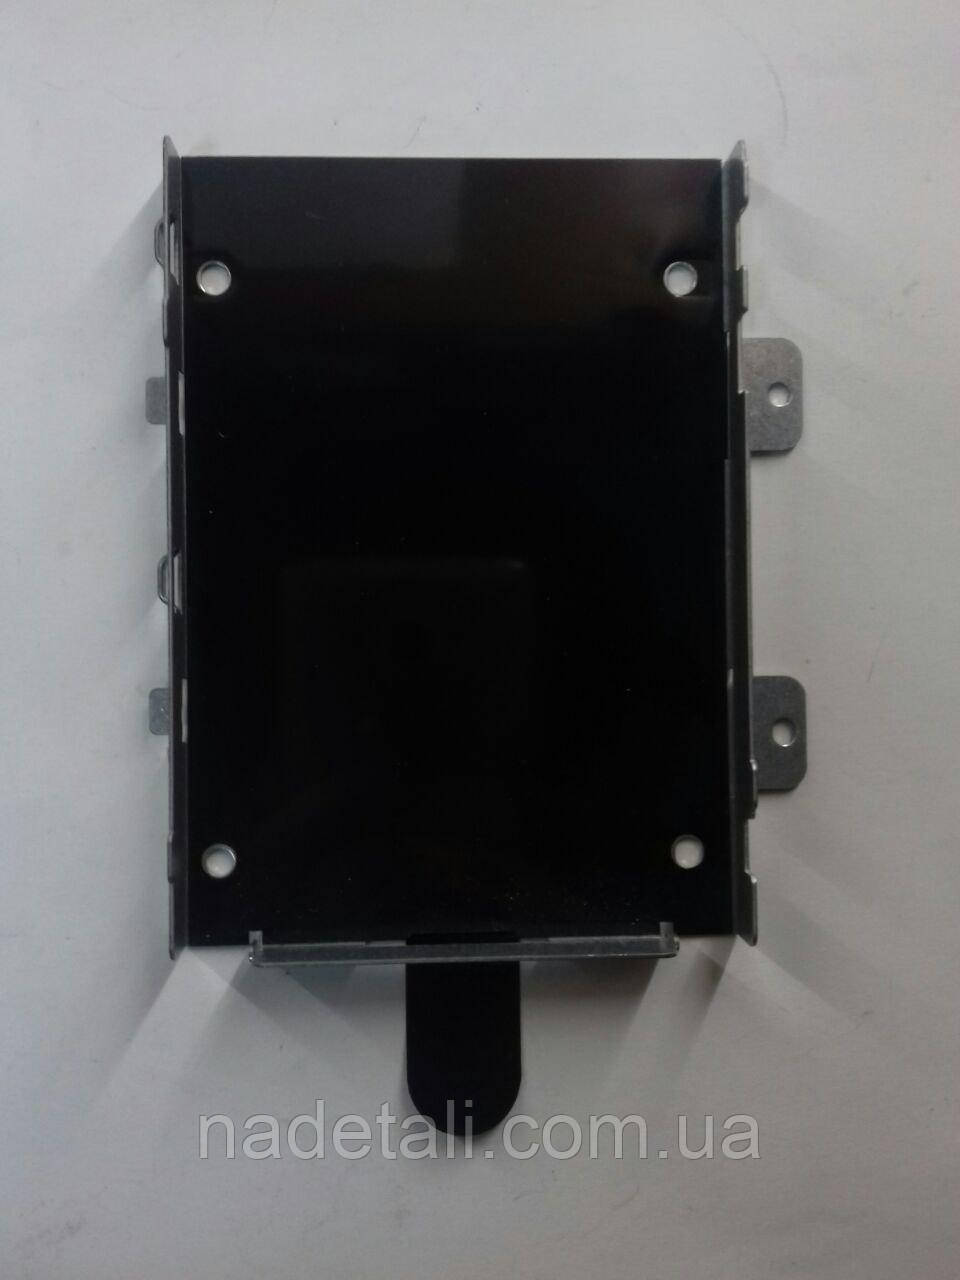 Корзина HDD Acer Extensa 5430 60.4T306.003